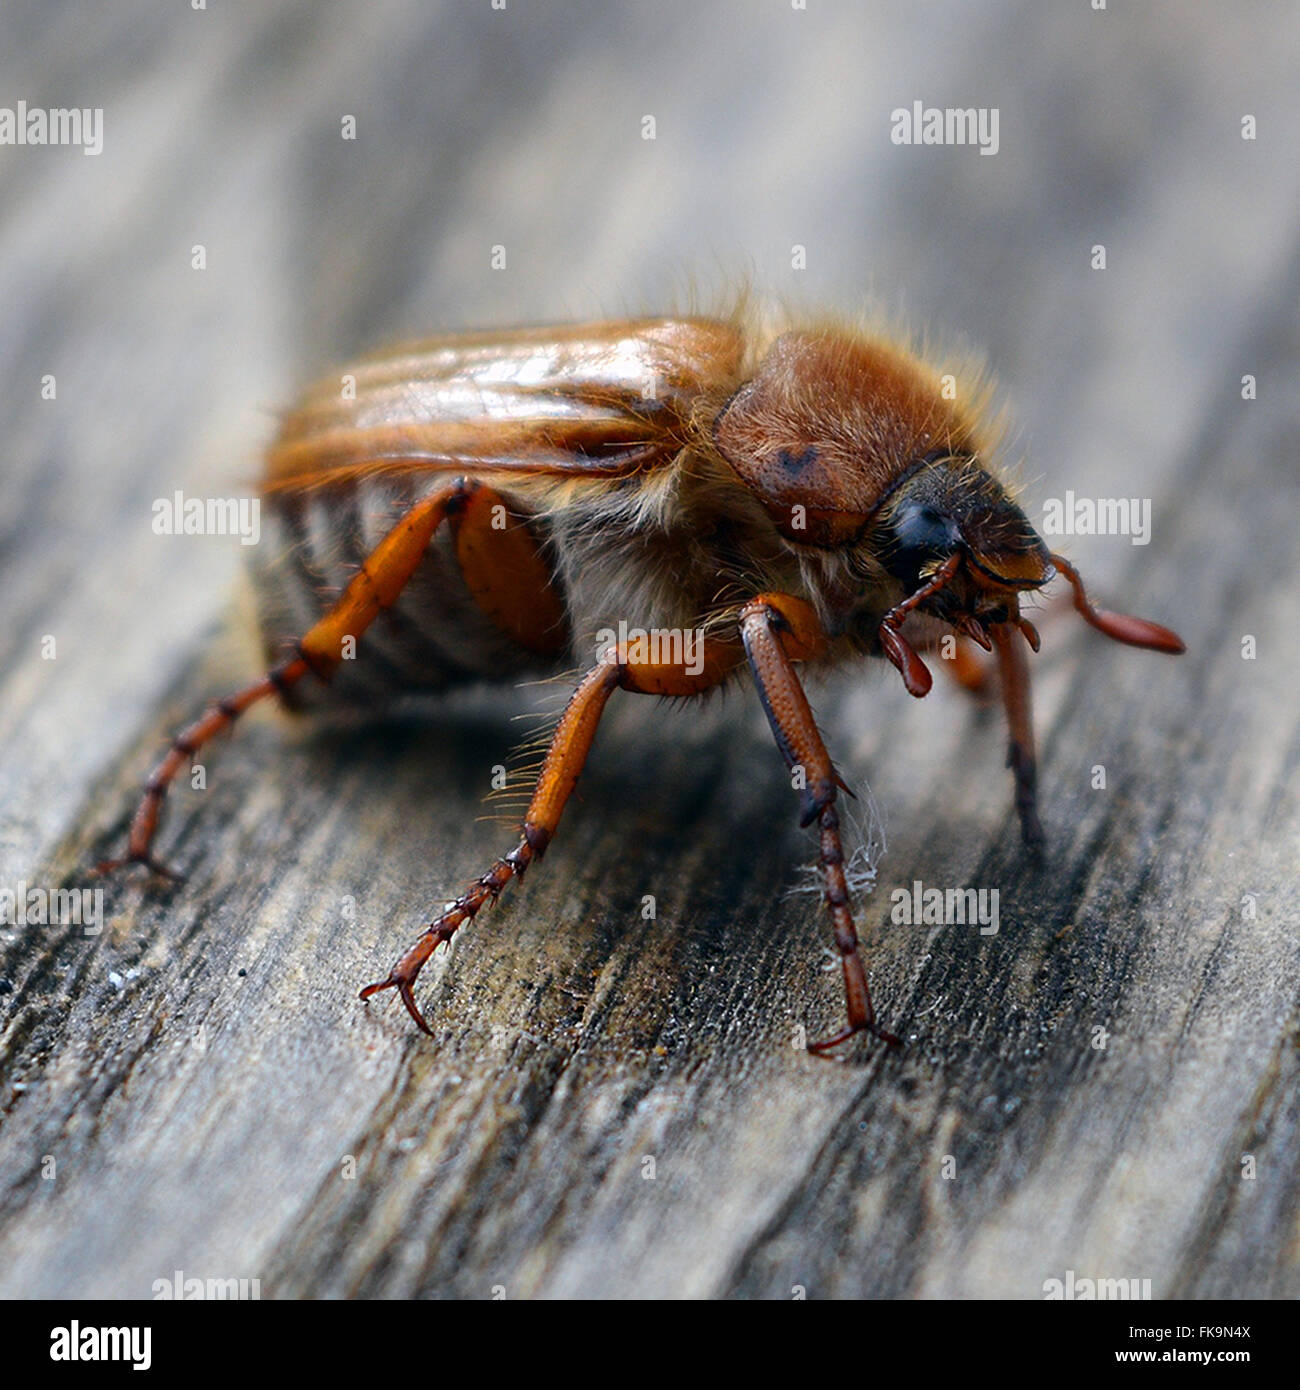 Captura de una macro Maybug sobre madera. Foto de stock